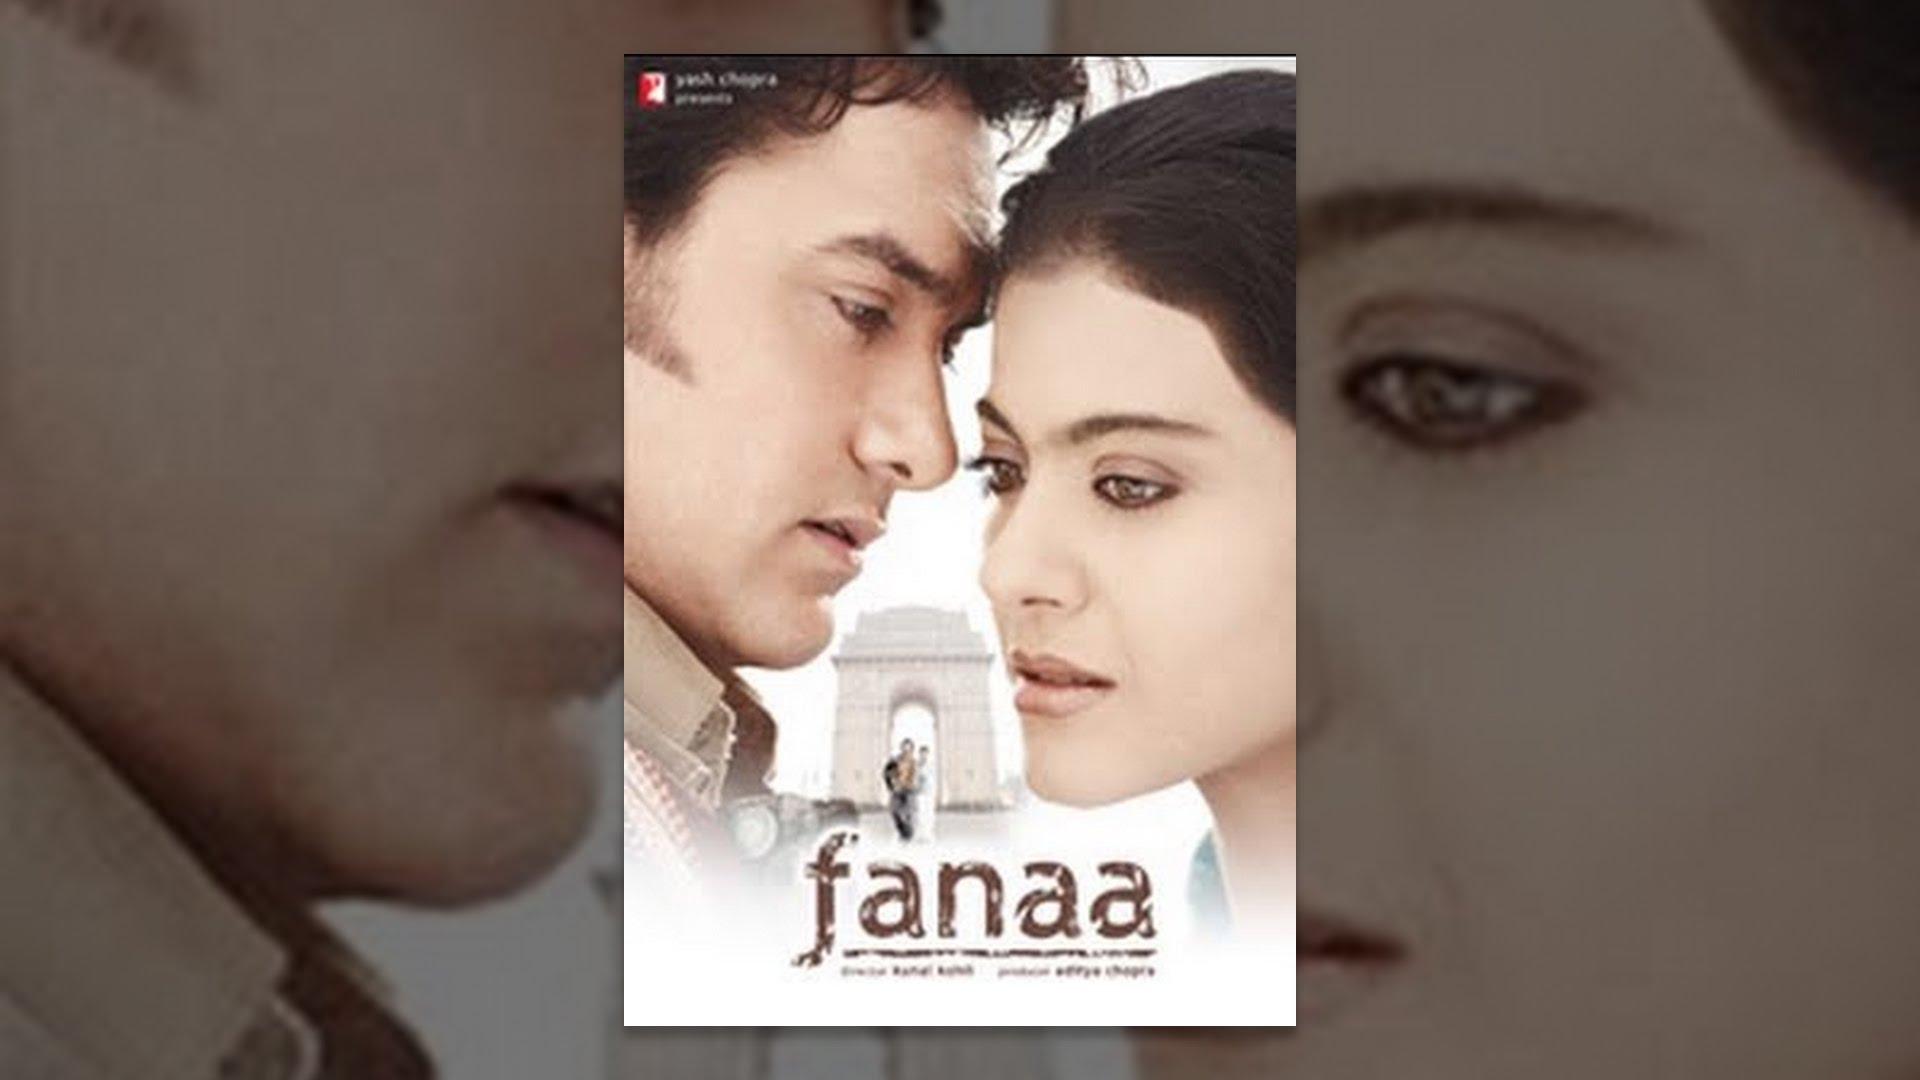 Download Fanaa